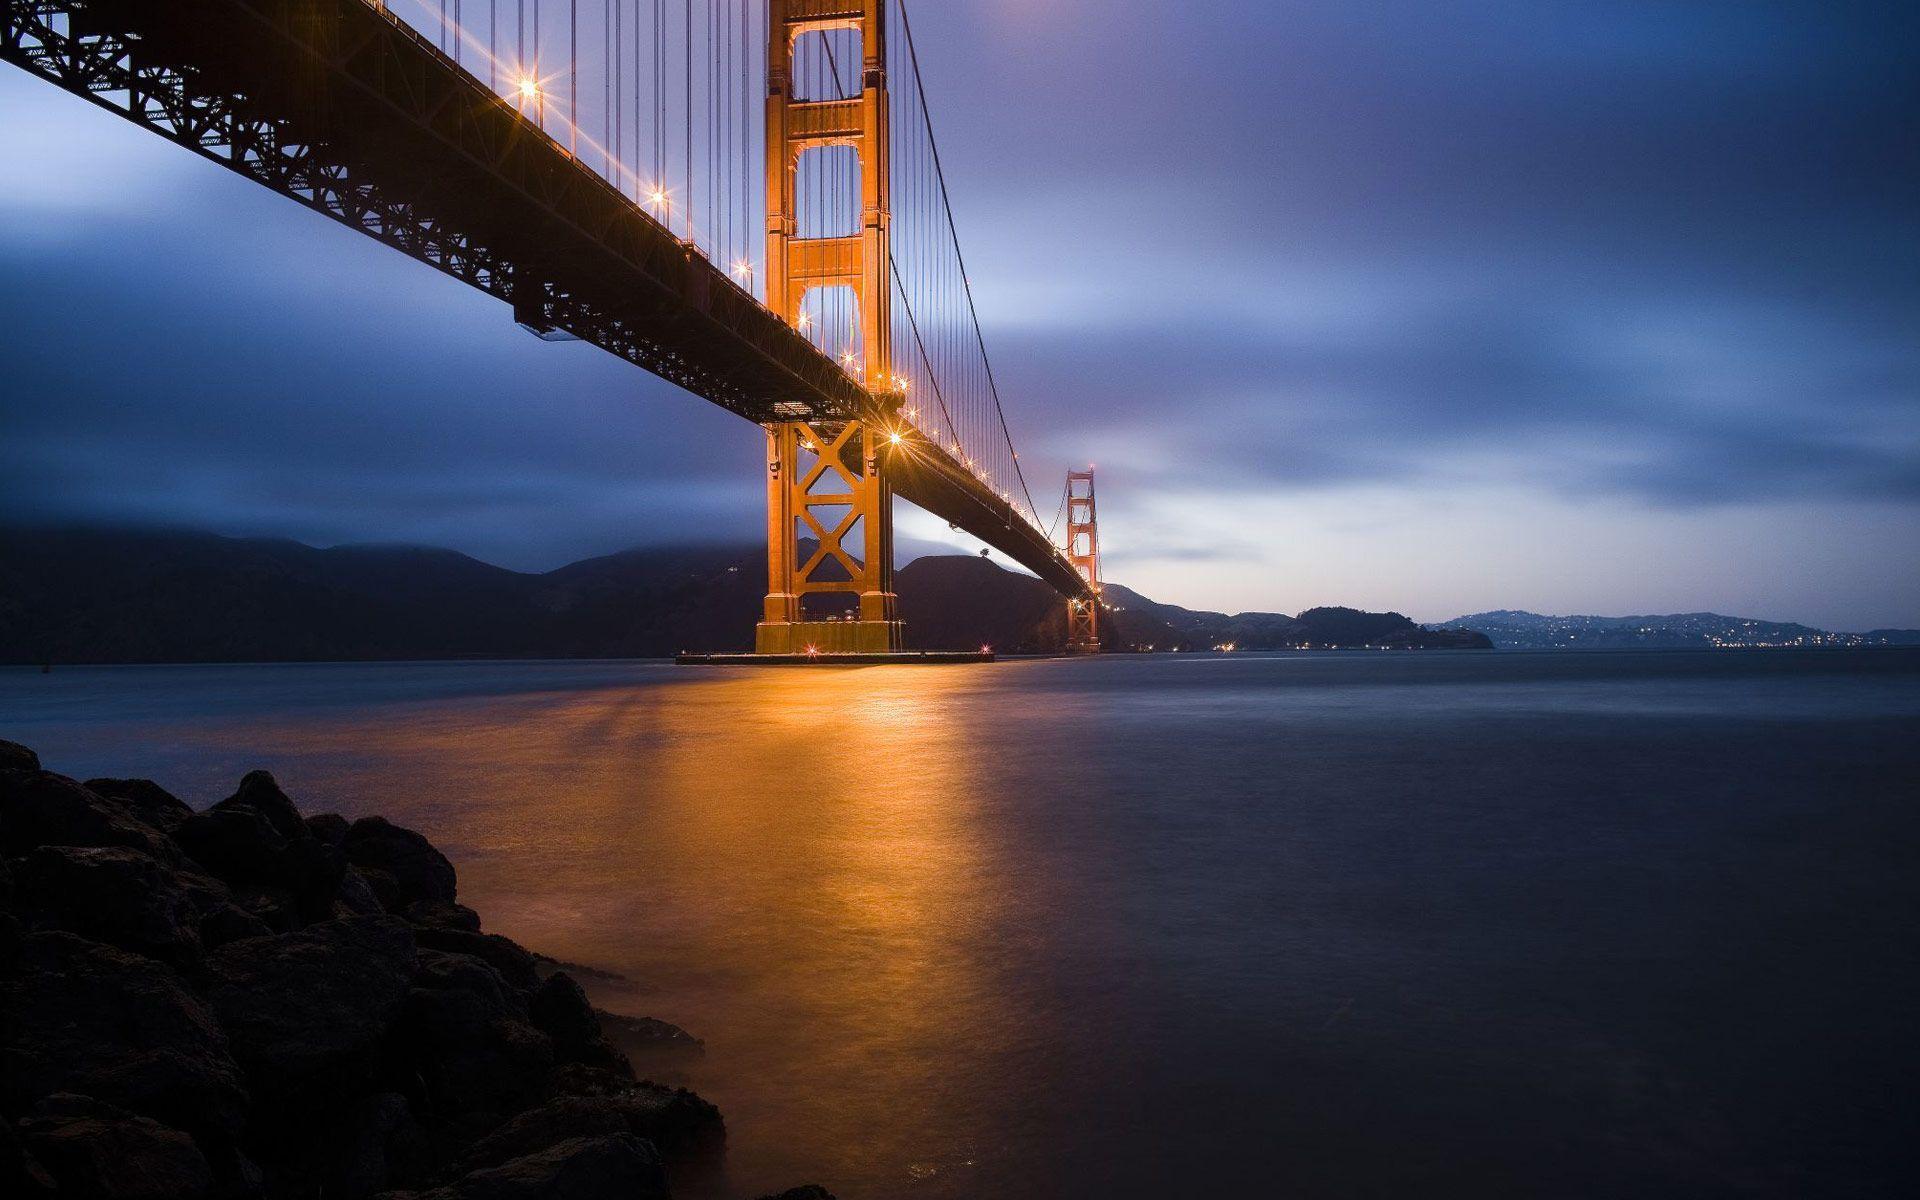 Golden Gate Bridge San Fransisco Wallpapers | HD Wallpapers